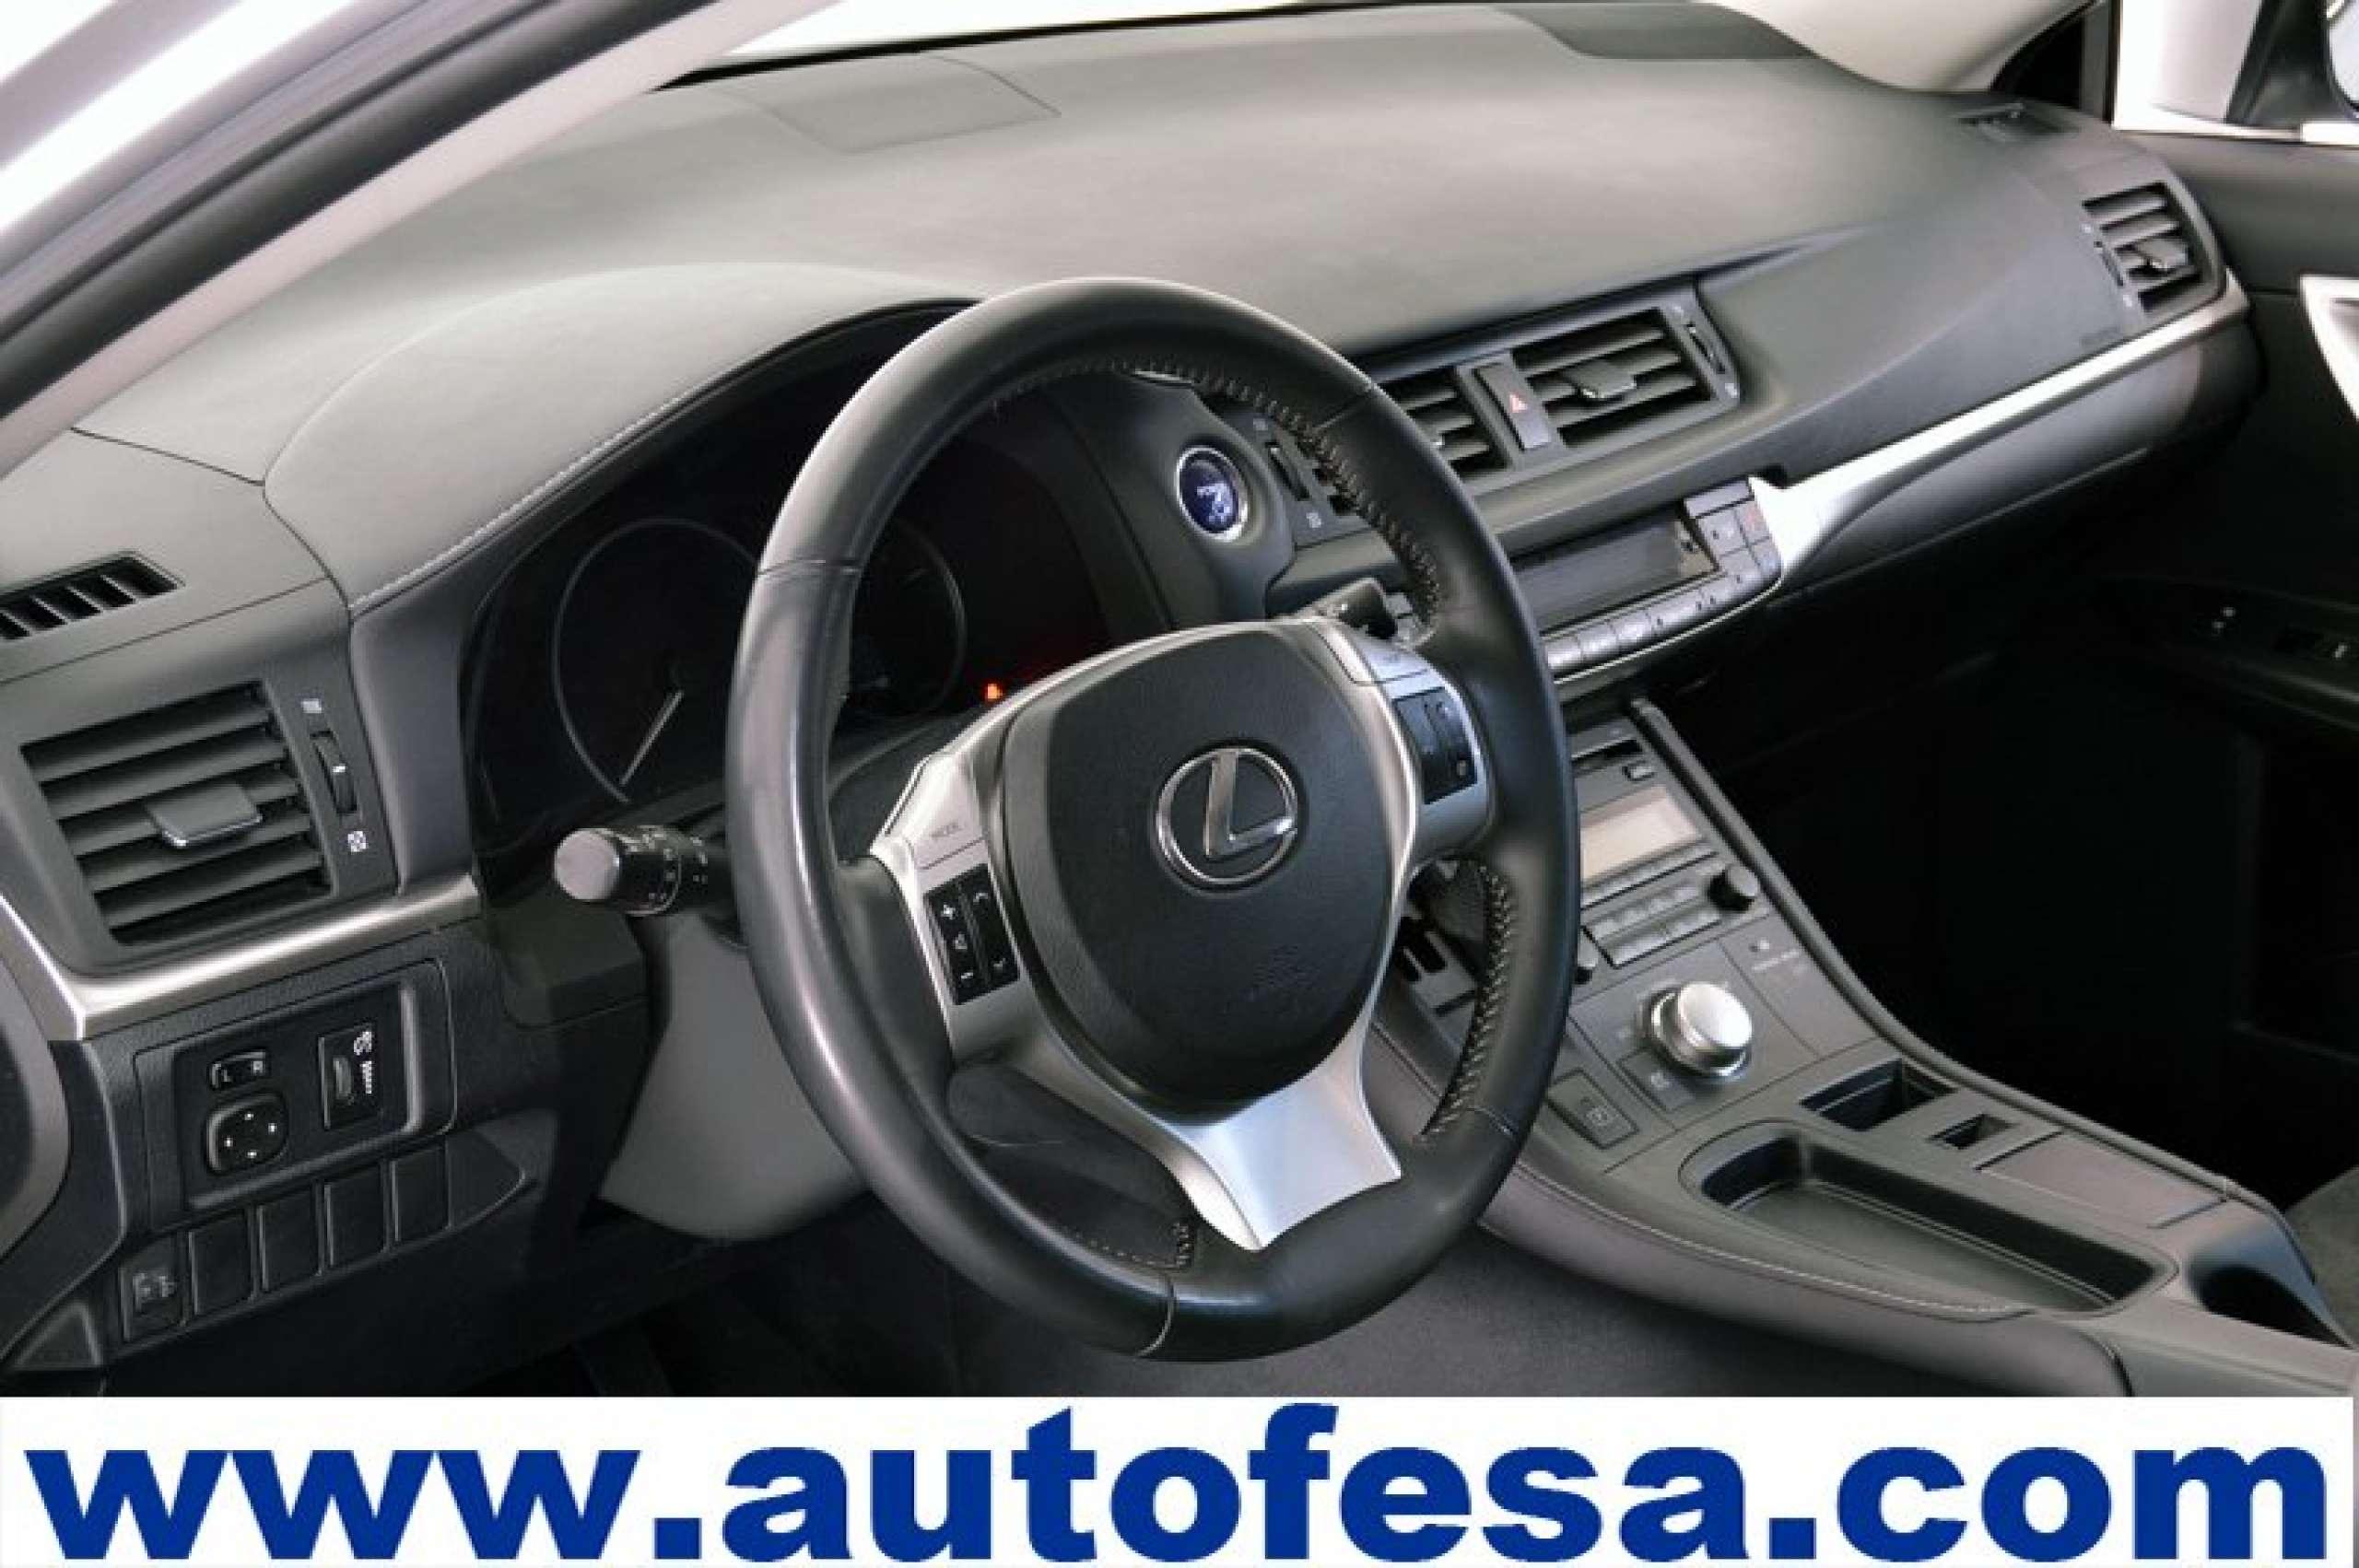 Lexus Ct 200h 1.8 136cv Eco Auto 5p - Foto 20